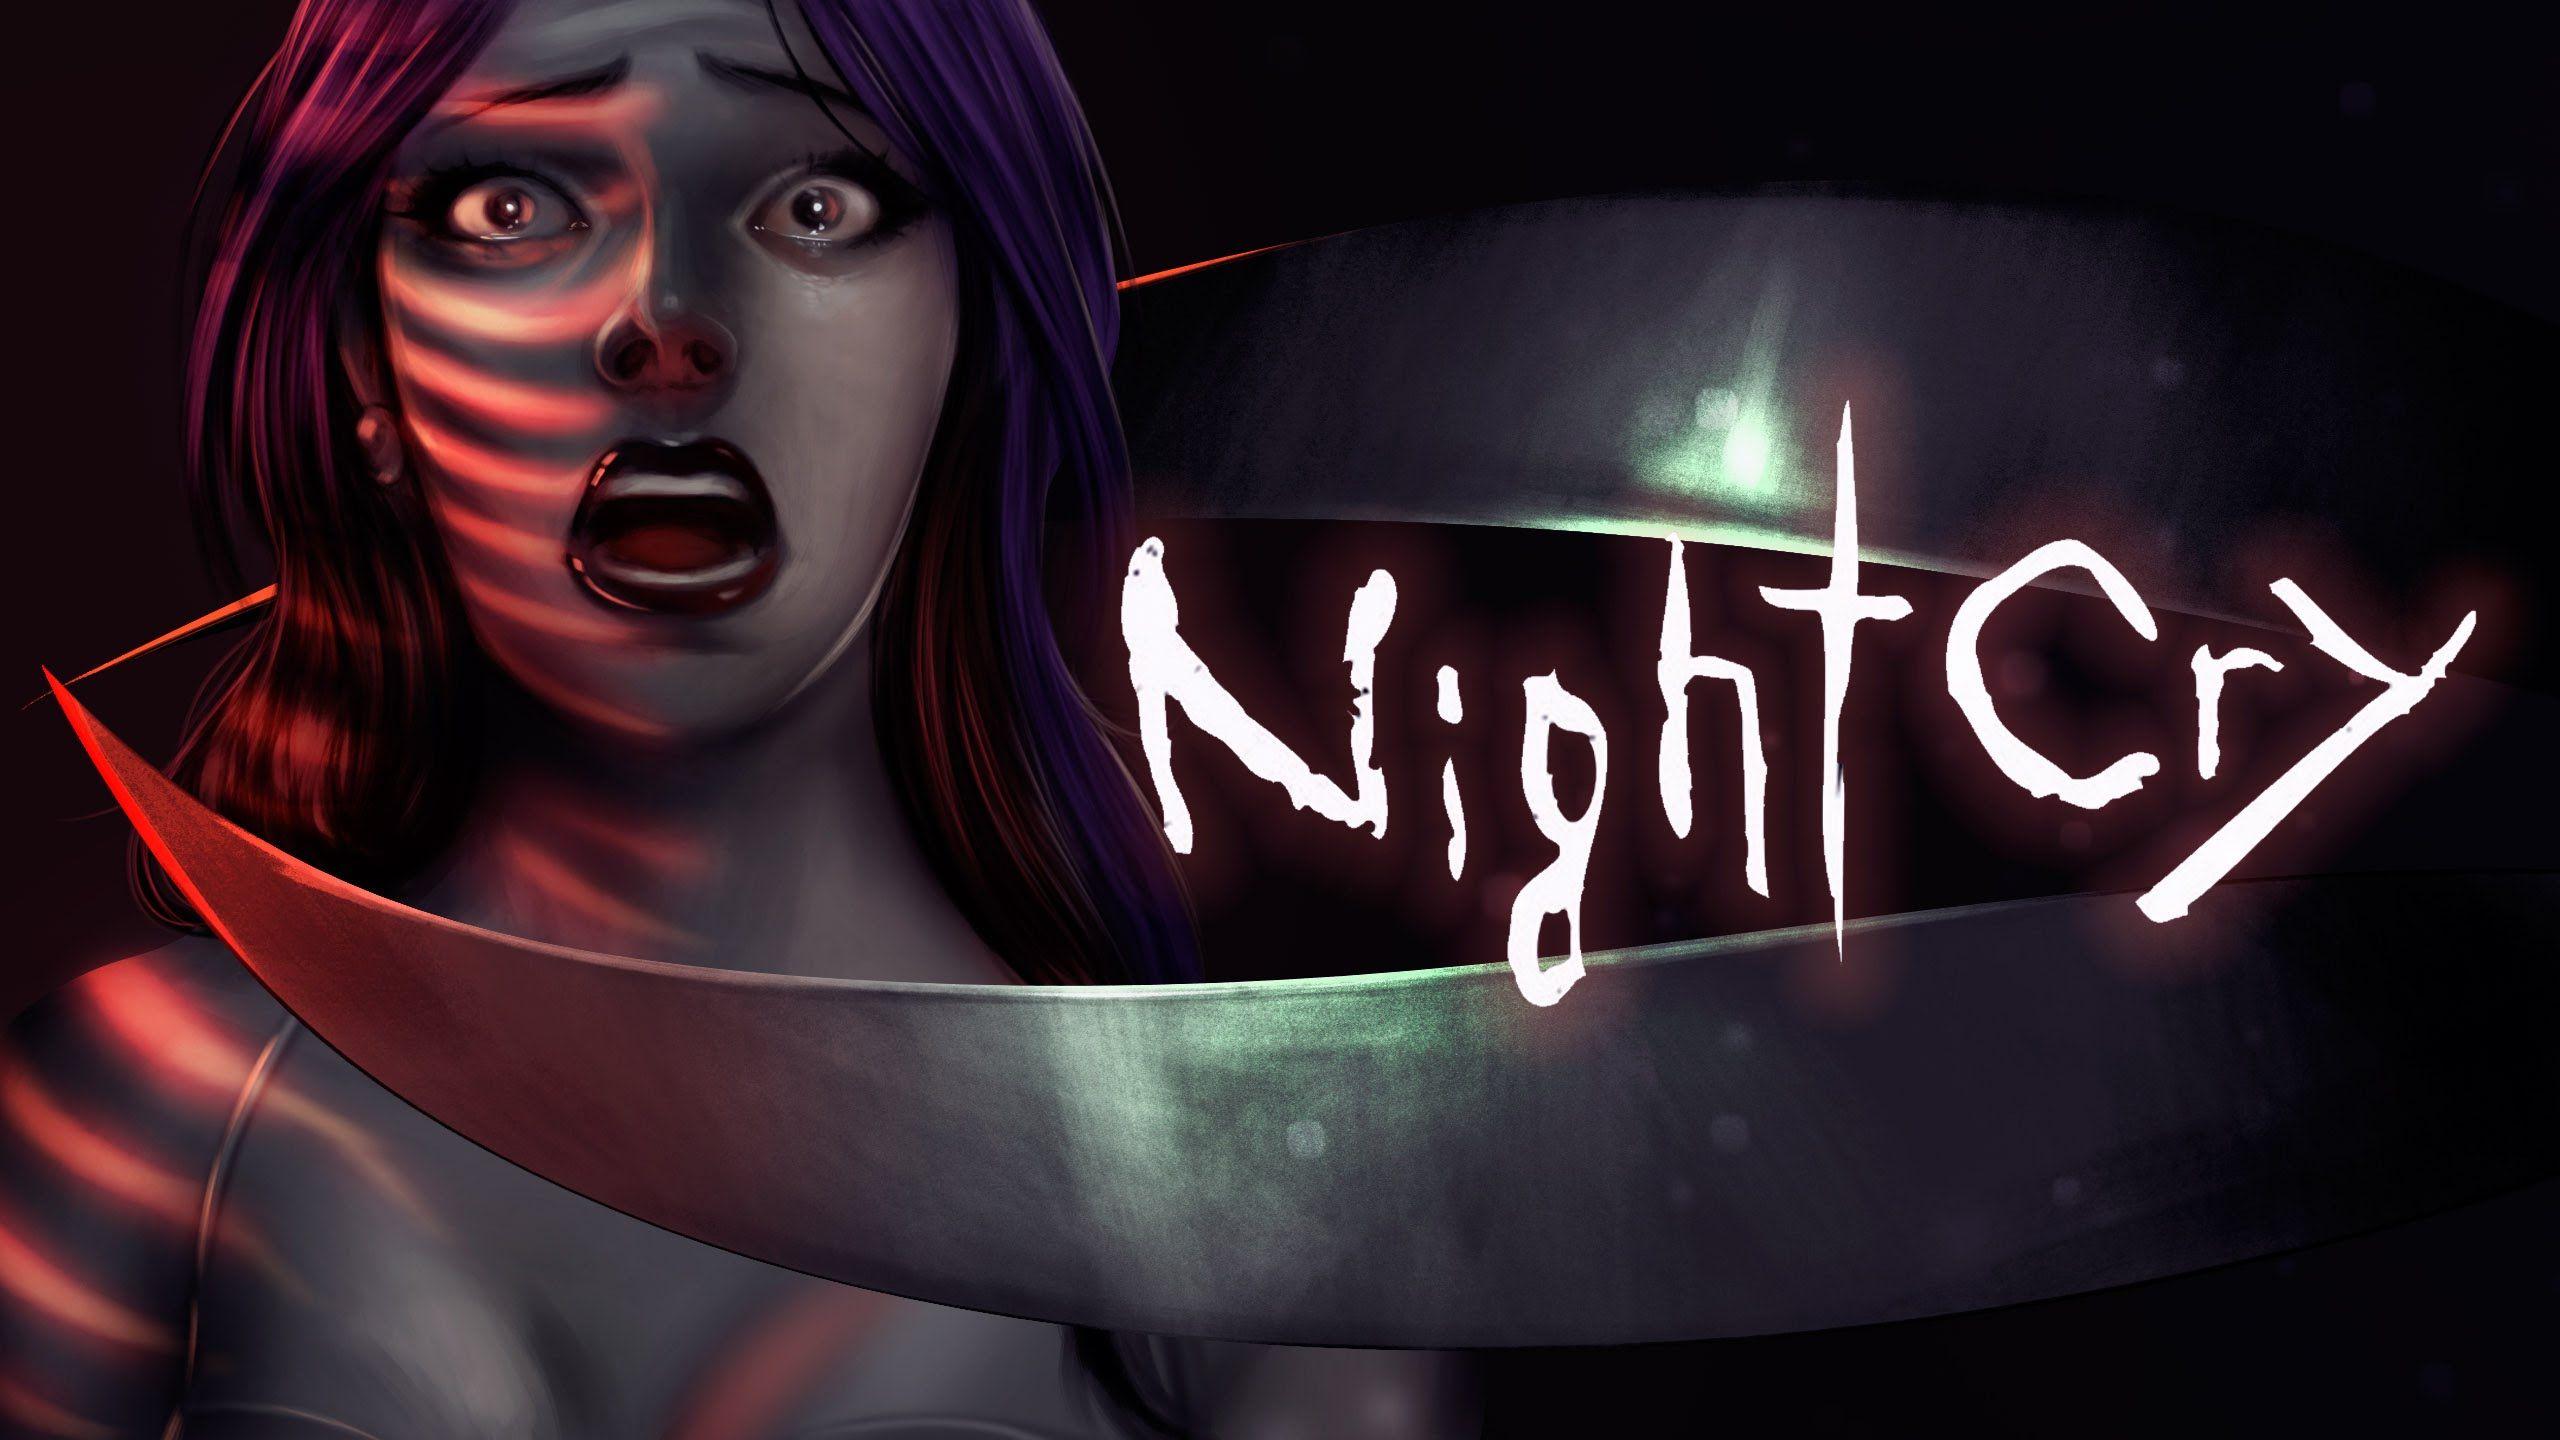 NEVER RUN WITH SCISSORS Nightcry 01 TheRPGMinx youtube vids 2560x1440